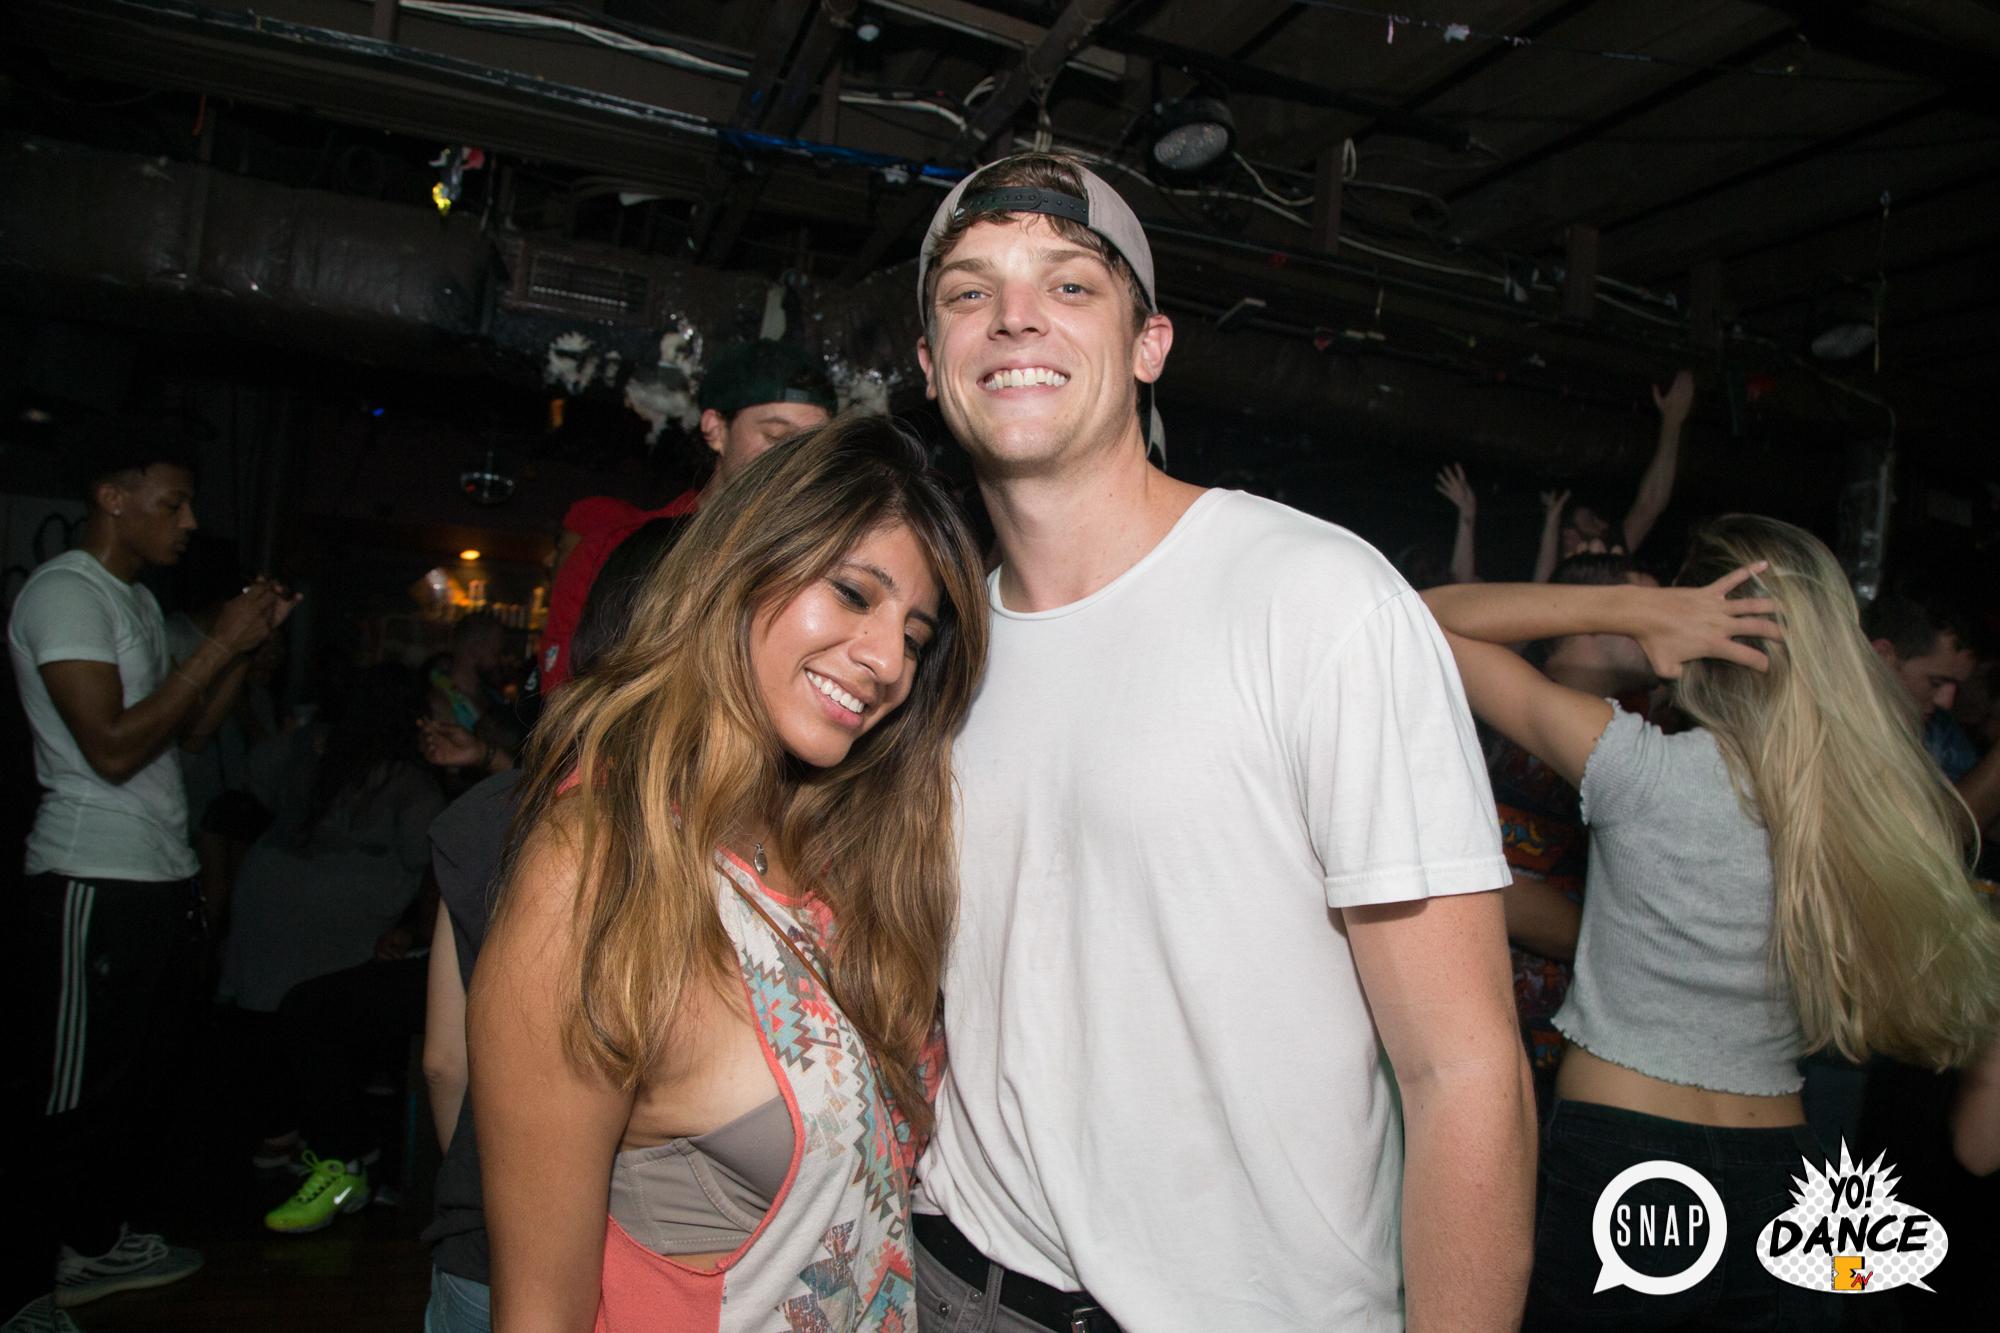 54Yo Dance Oh Snap Kid Atlanta.jpg